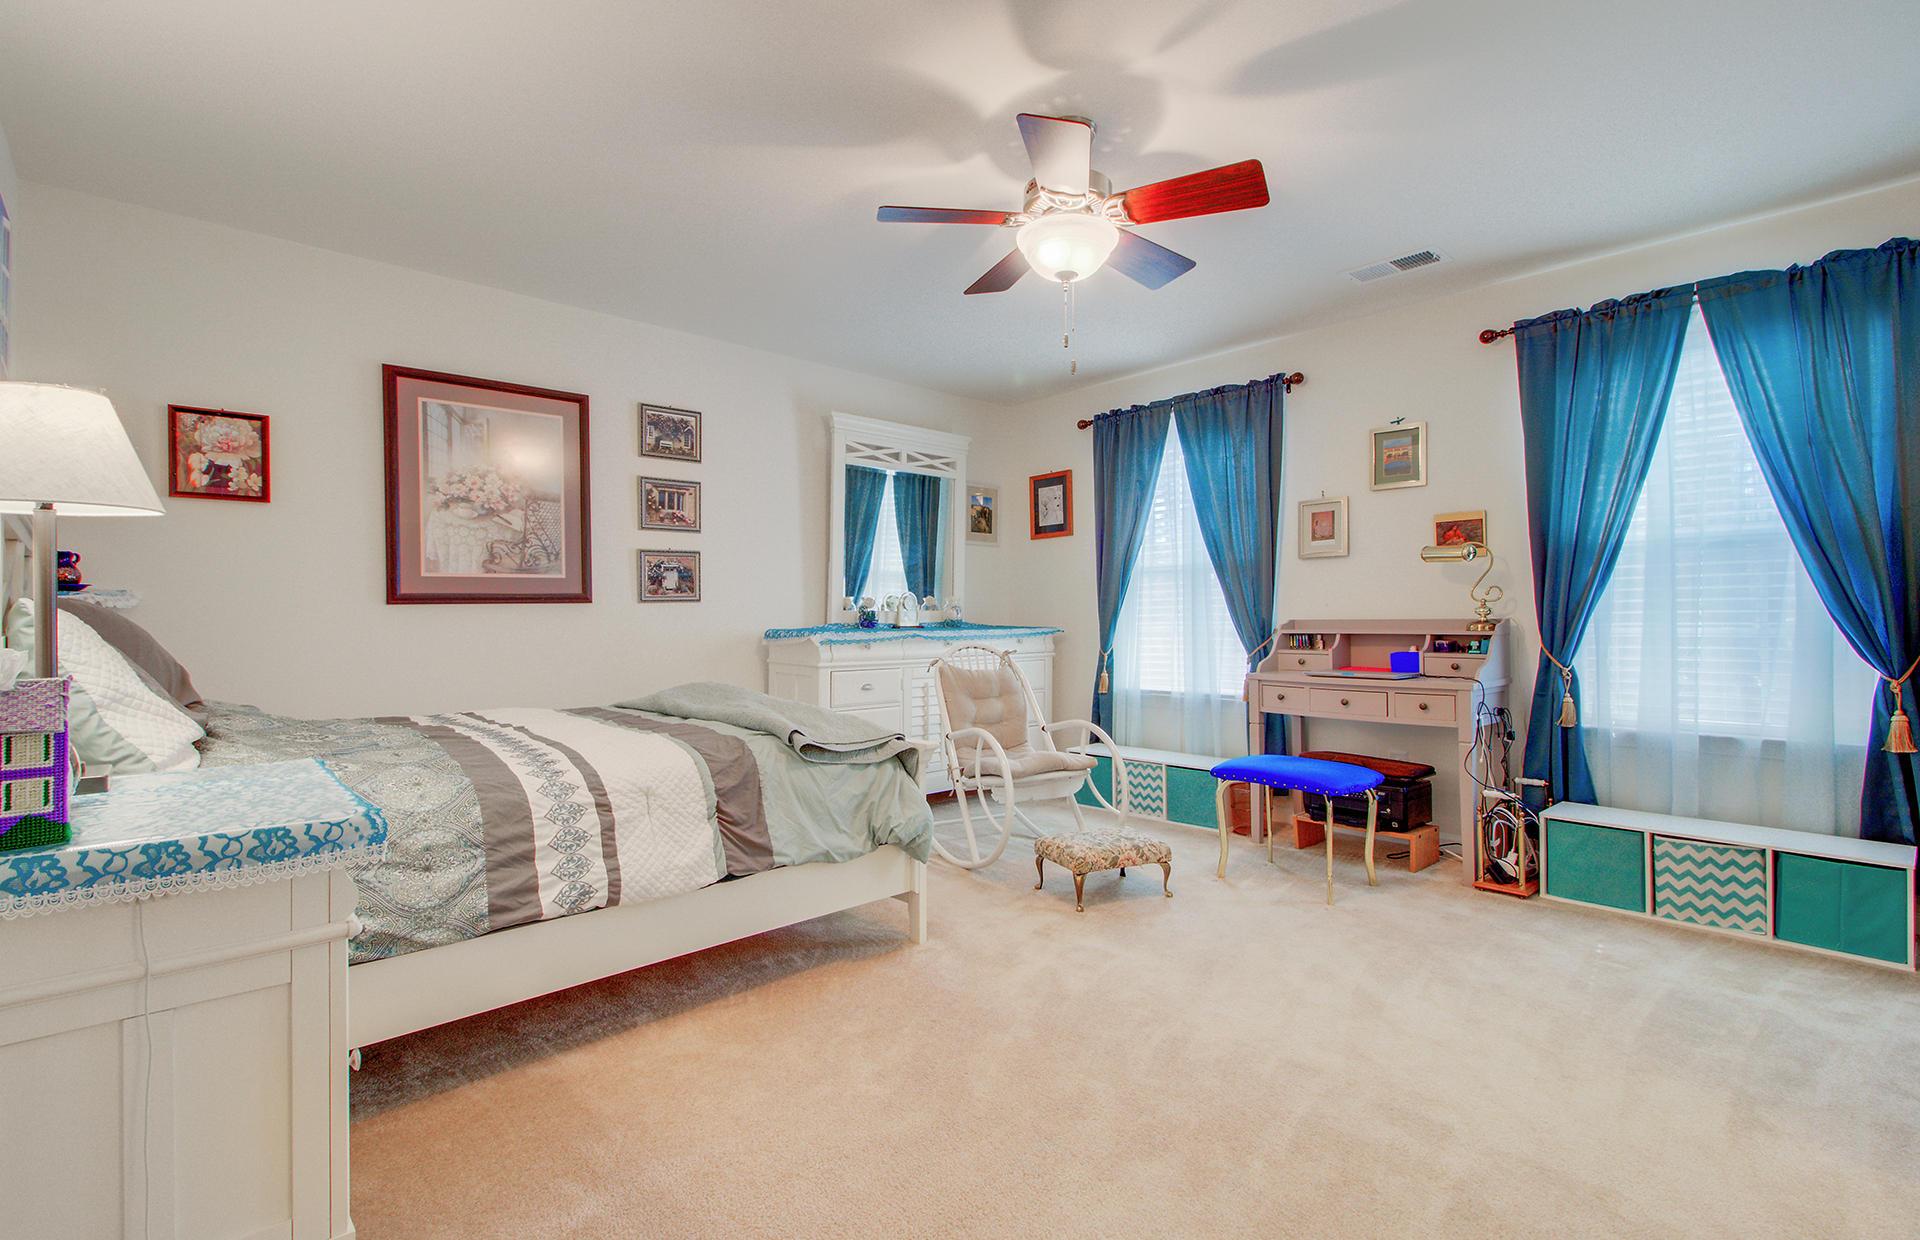 Cane Bay Plantation Homes For Sale - 255 Spectrum, Summerville, SC - 18